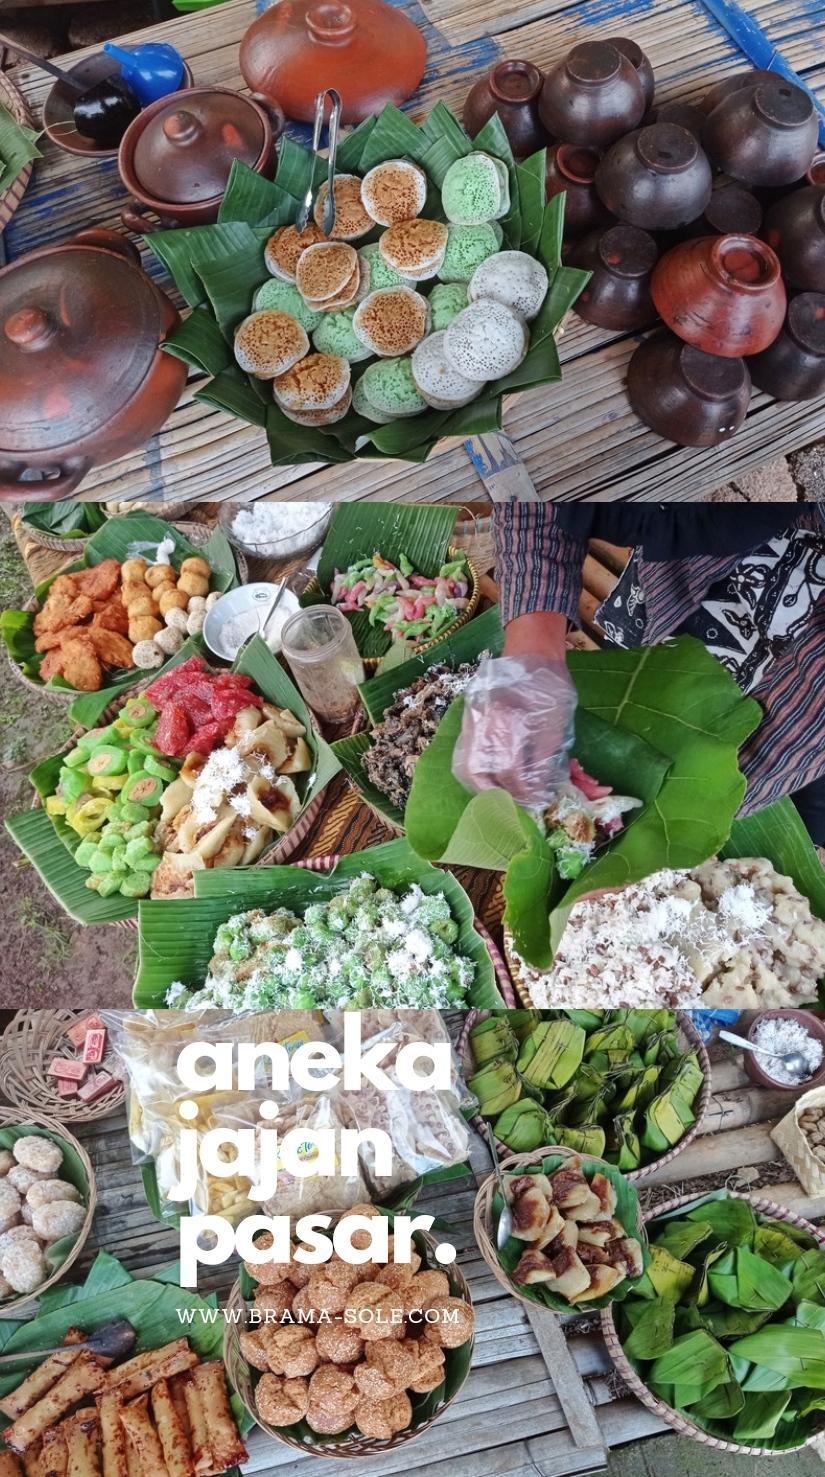 Aneka jajan pasar dan camilan tradisional pasar sawahan